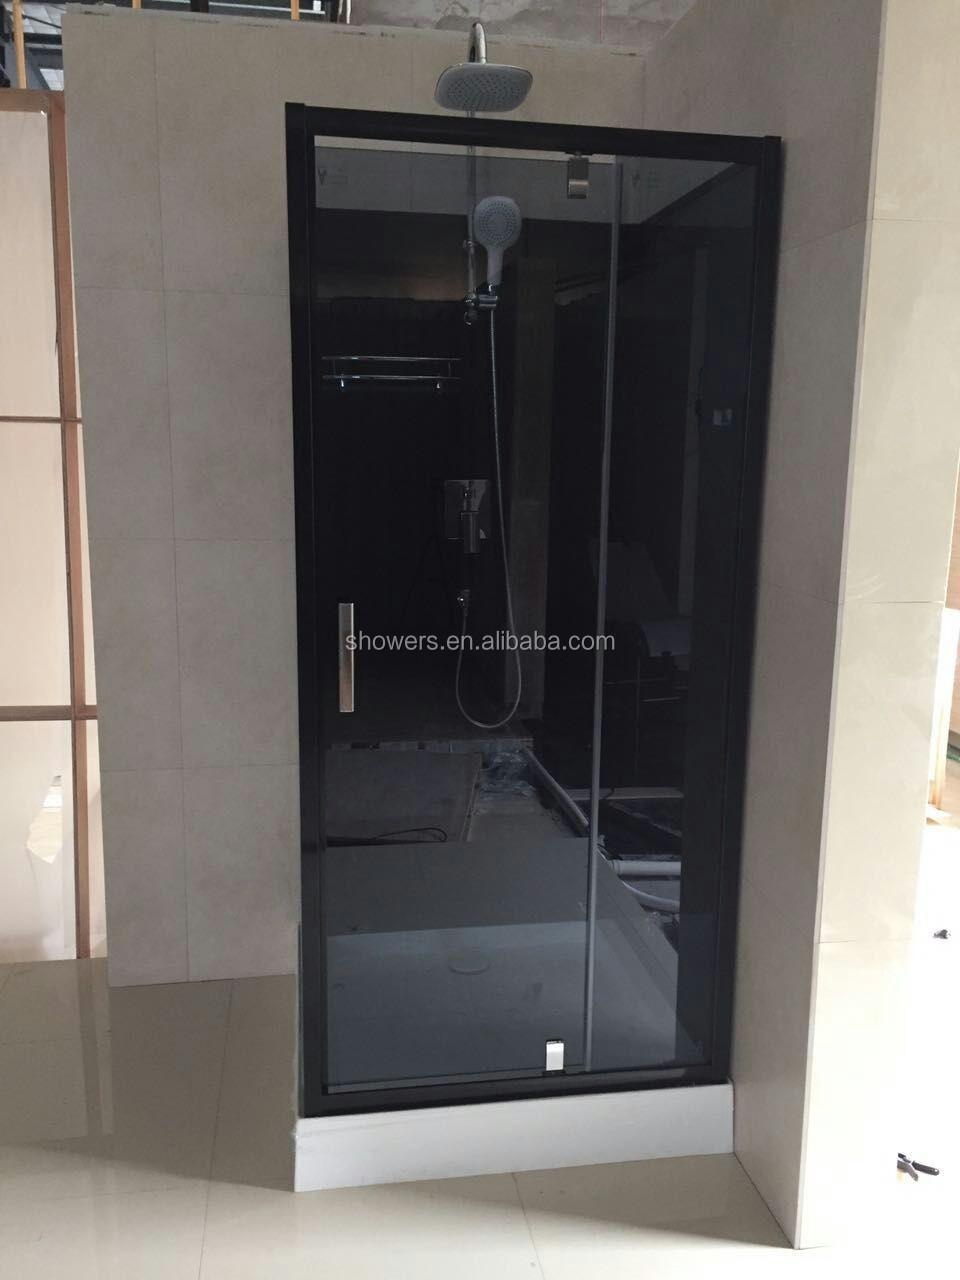 australia bath shower cubicle shower cabin hangzhou shower australia bath shower cubicle shower cabin hangzhou shower